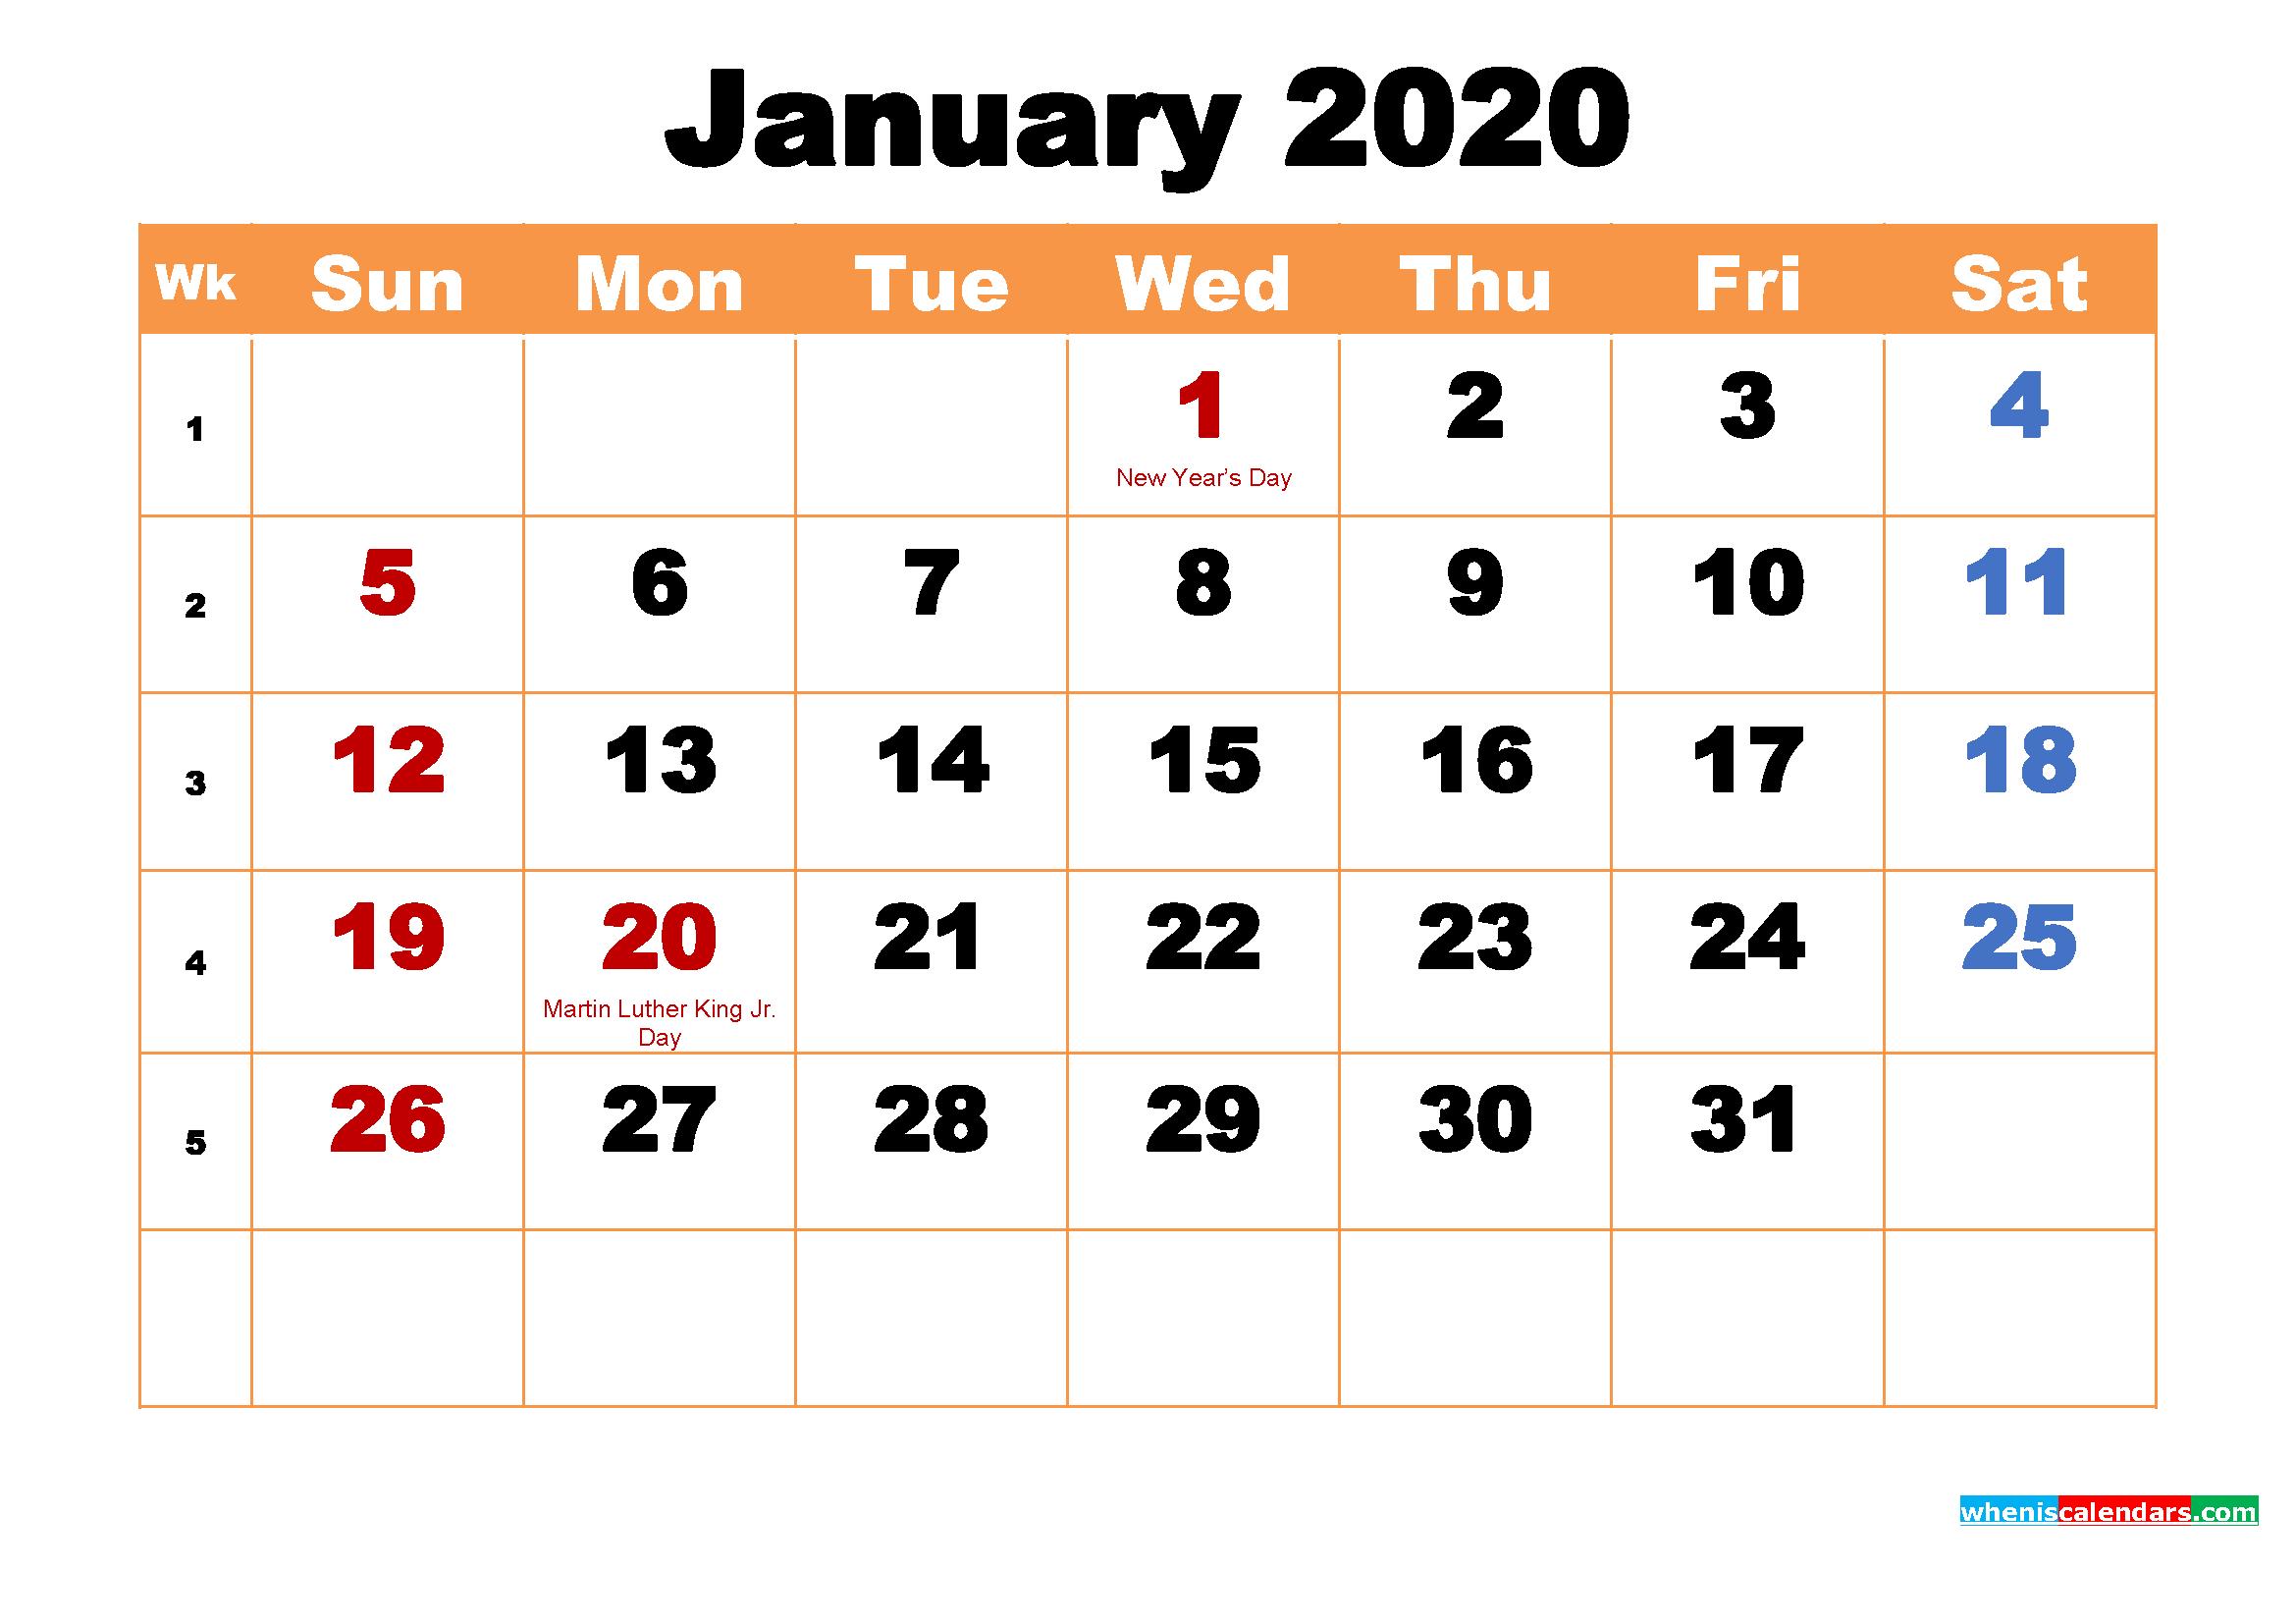 January 2020 Calendar Wallpaper High Resolution Free